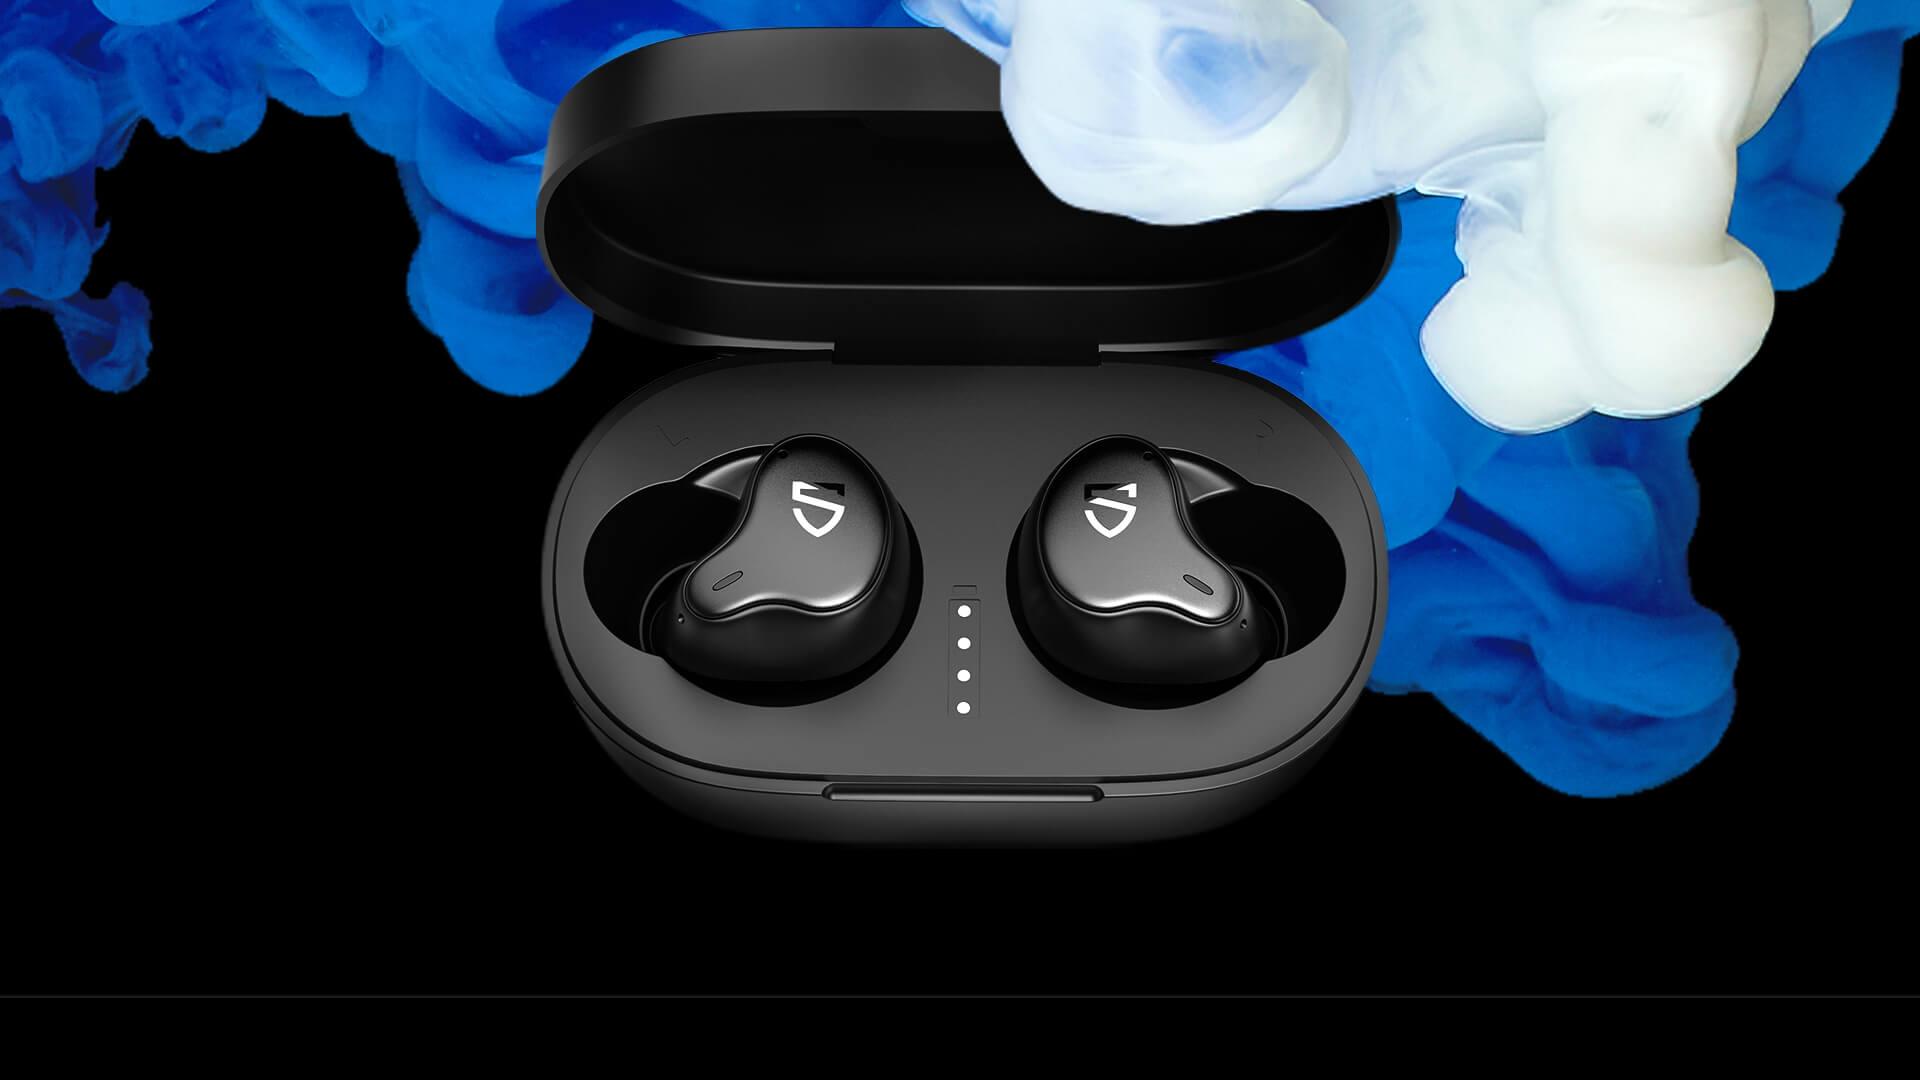 SOUNDPEATS earbuds perfect alternative to headphones